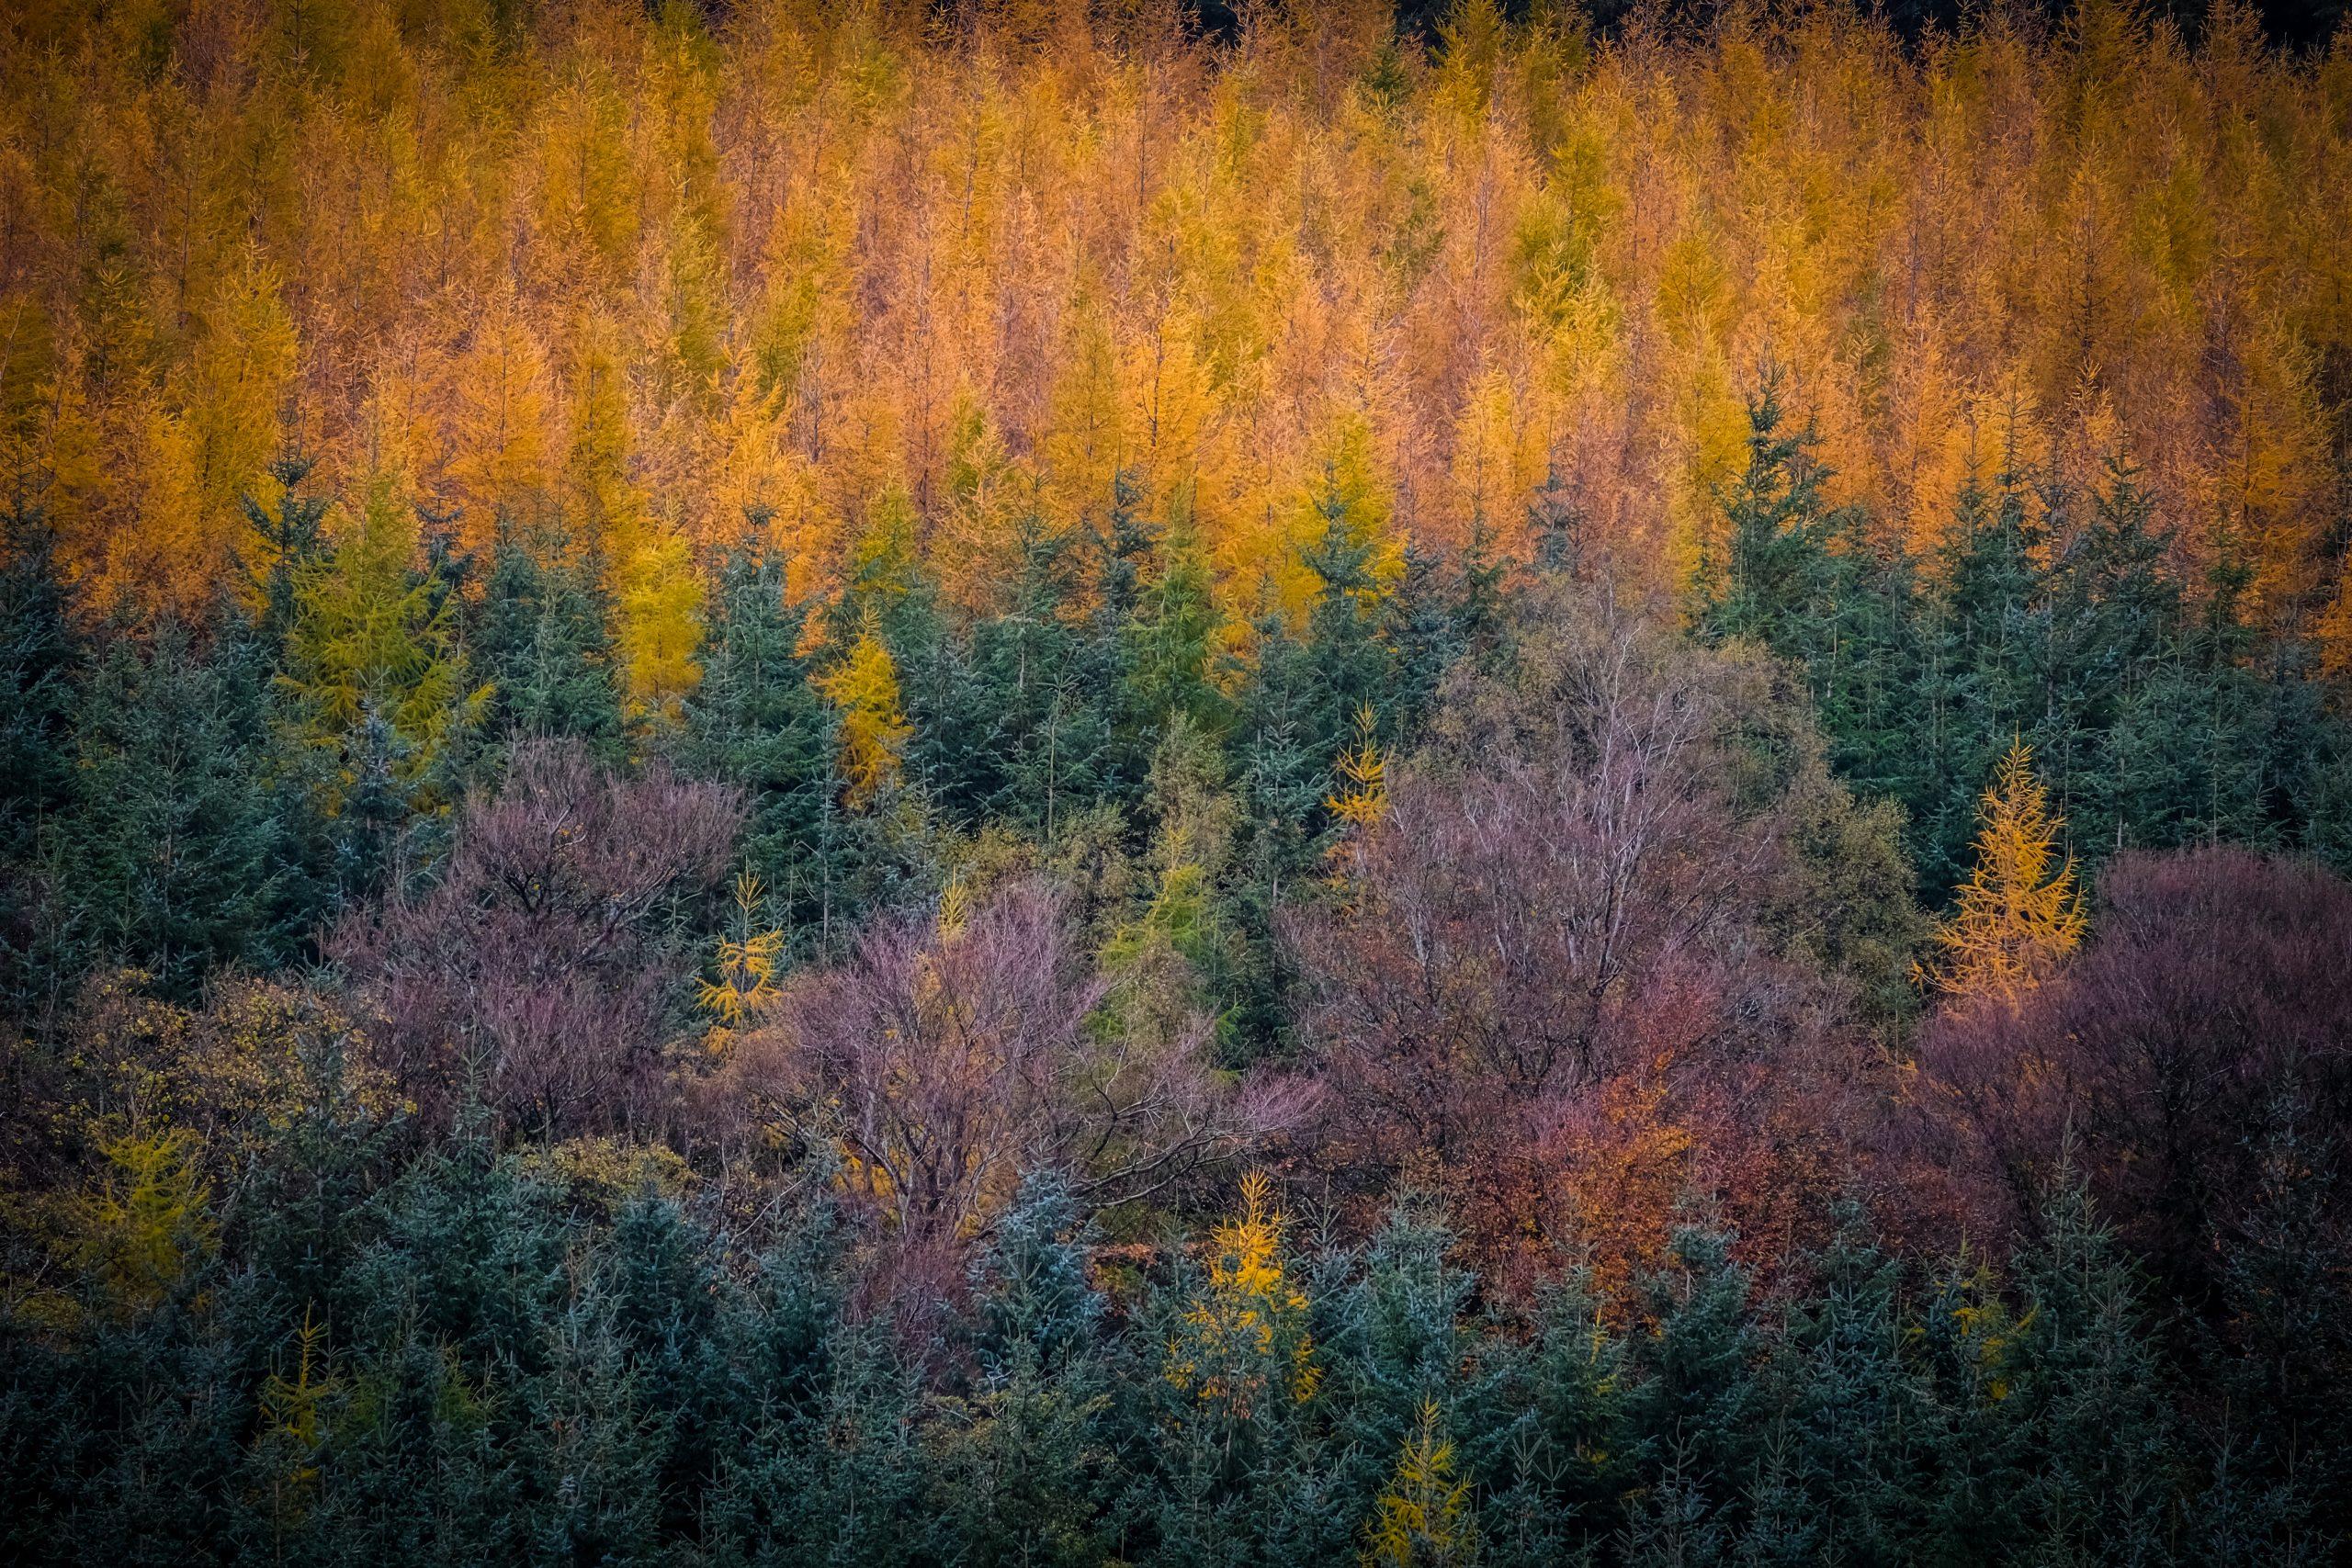 autumn-colours-fiona-madden-photography